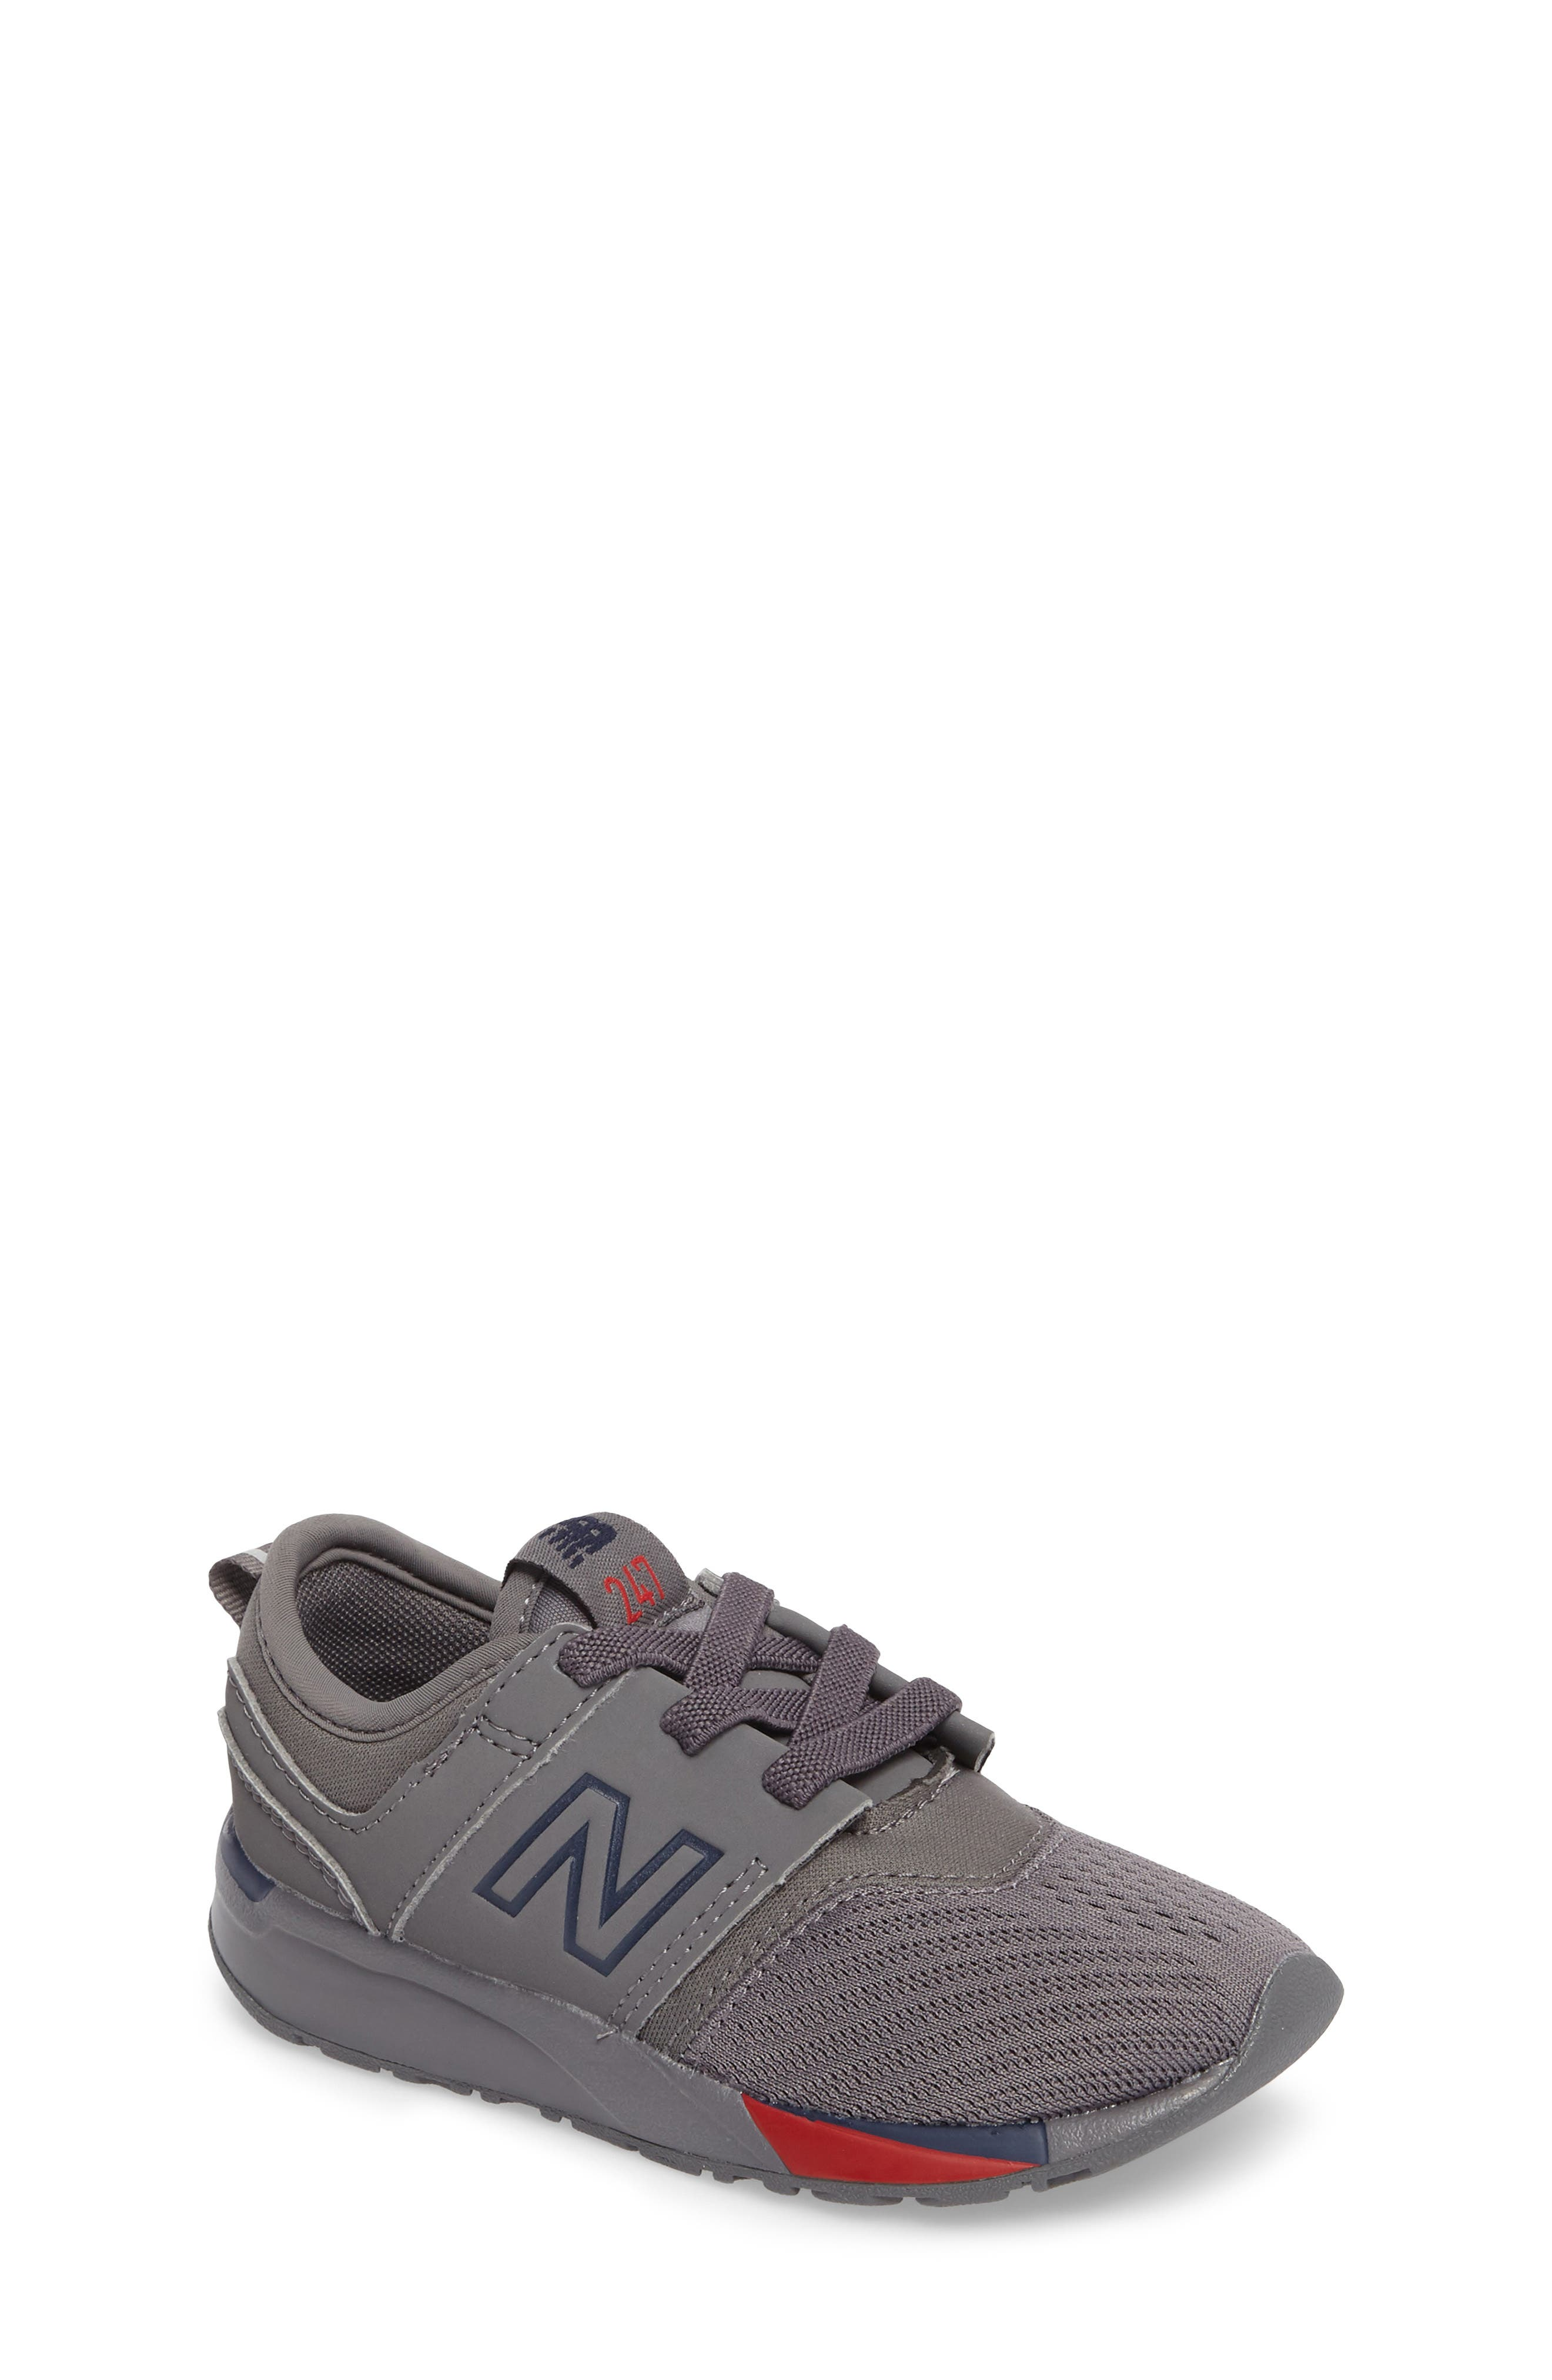 247 Sport Sneaker,                         Main,                         color, 039